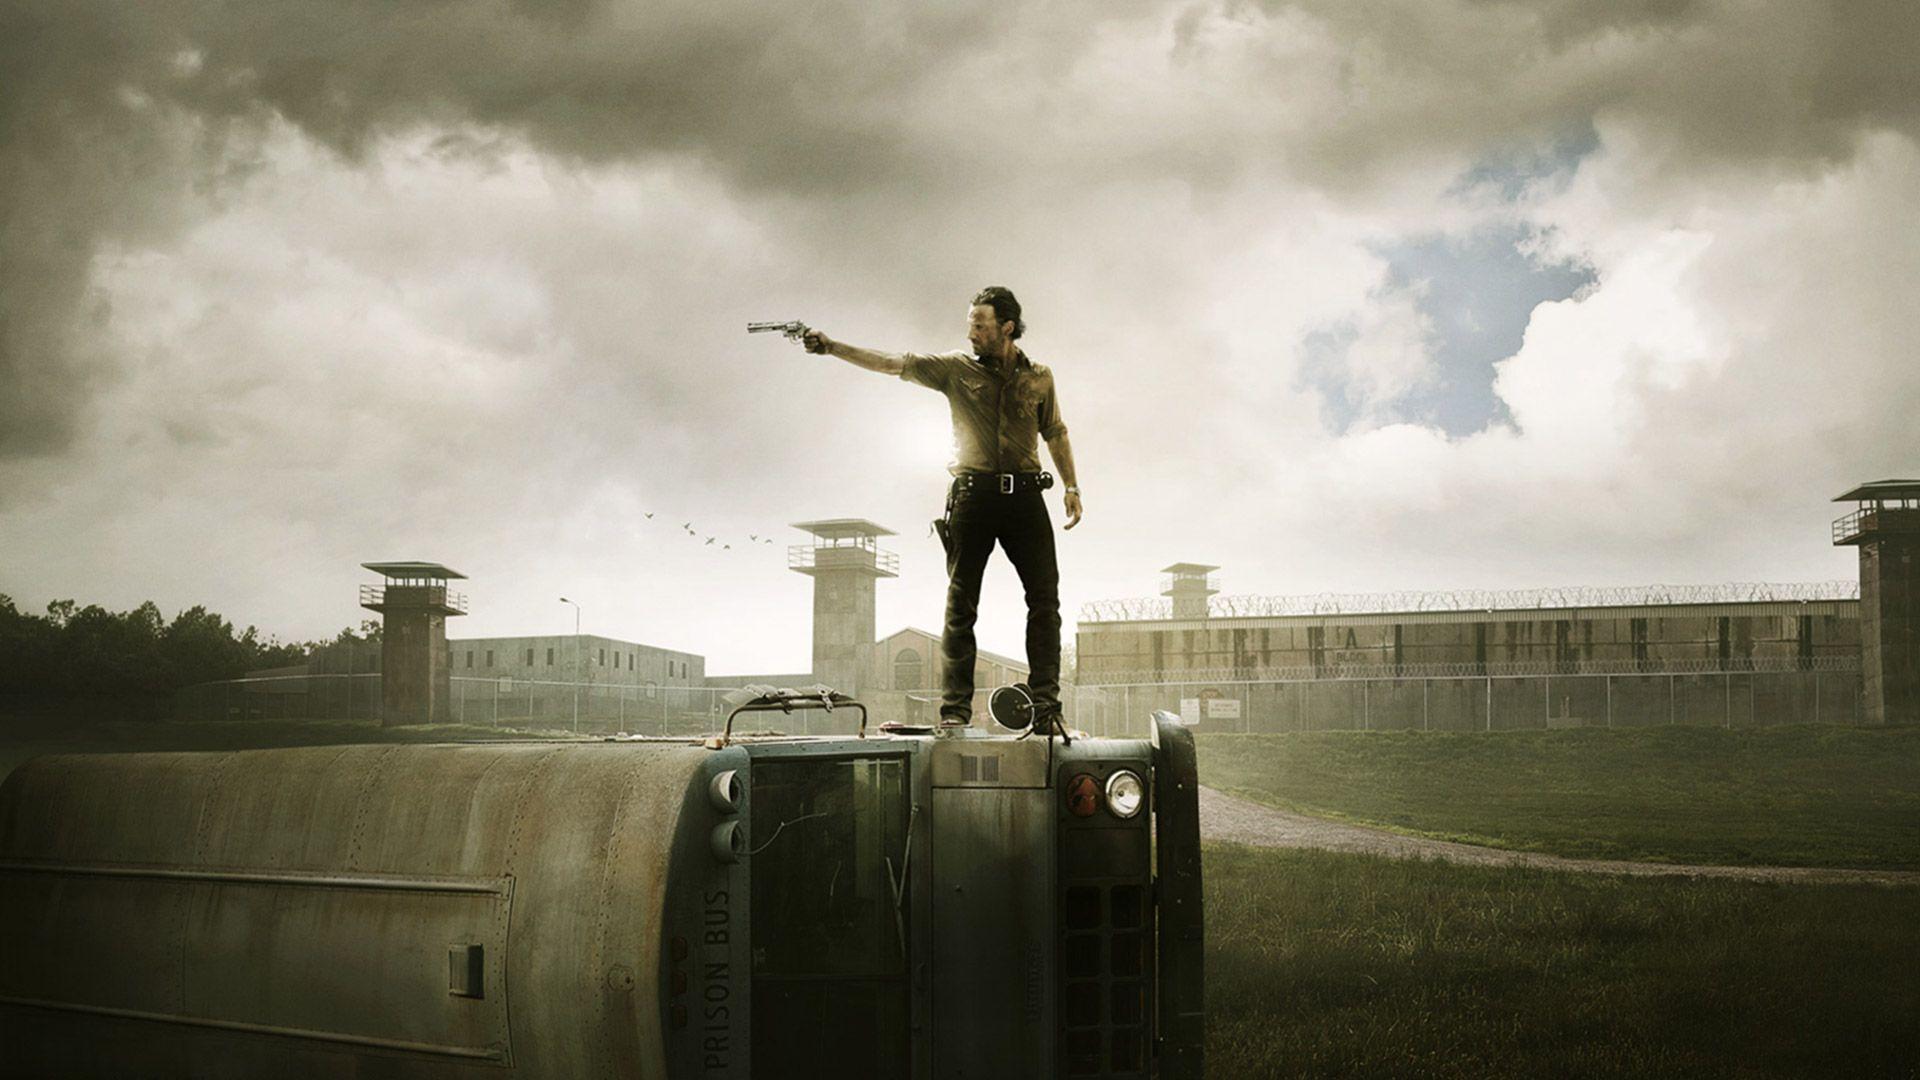 The Walking Dead Wallpaper HD For Desktop Best Collection